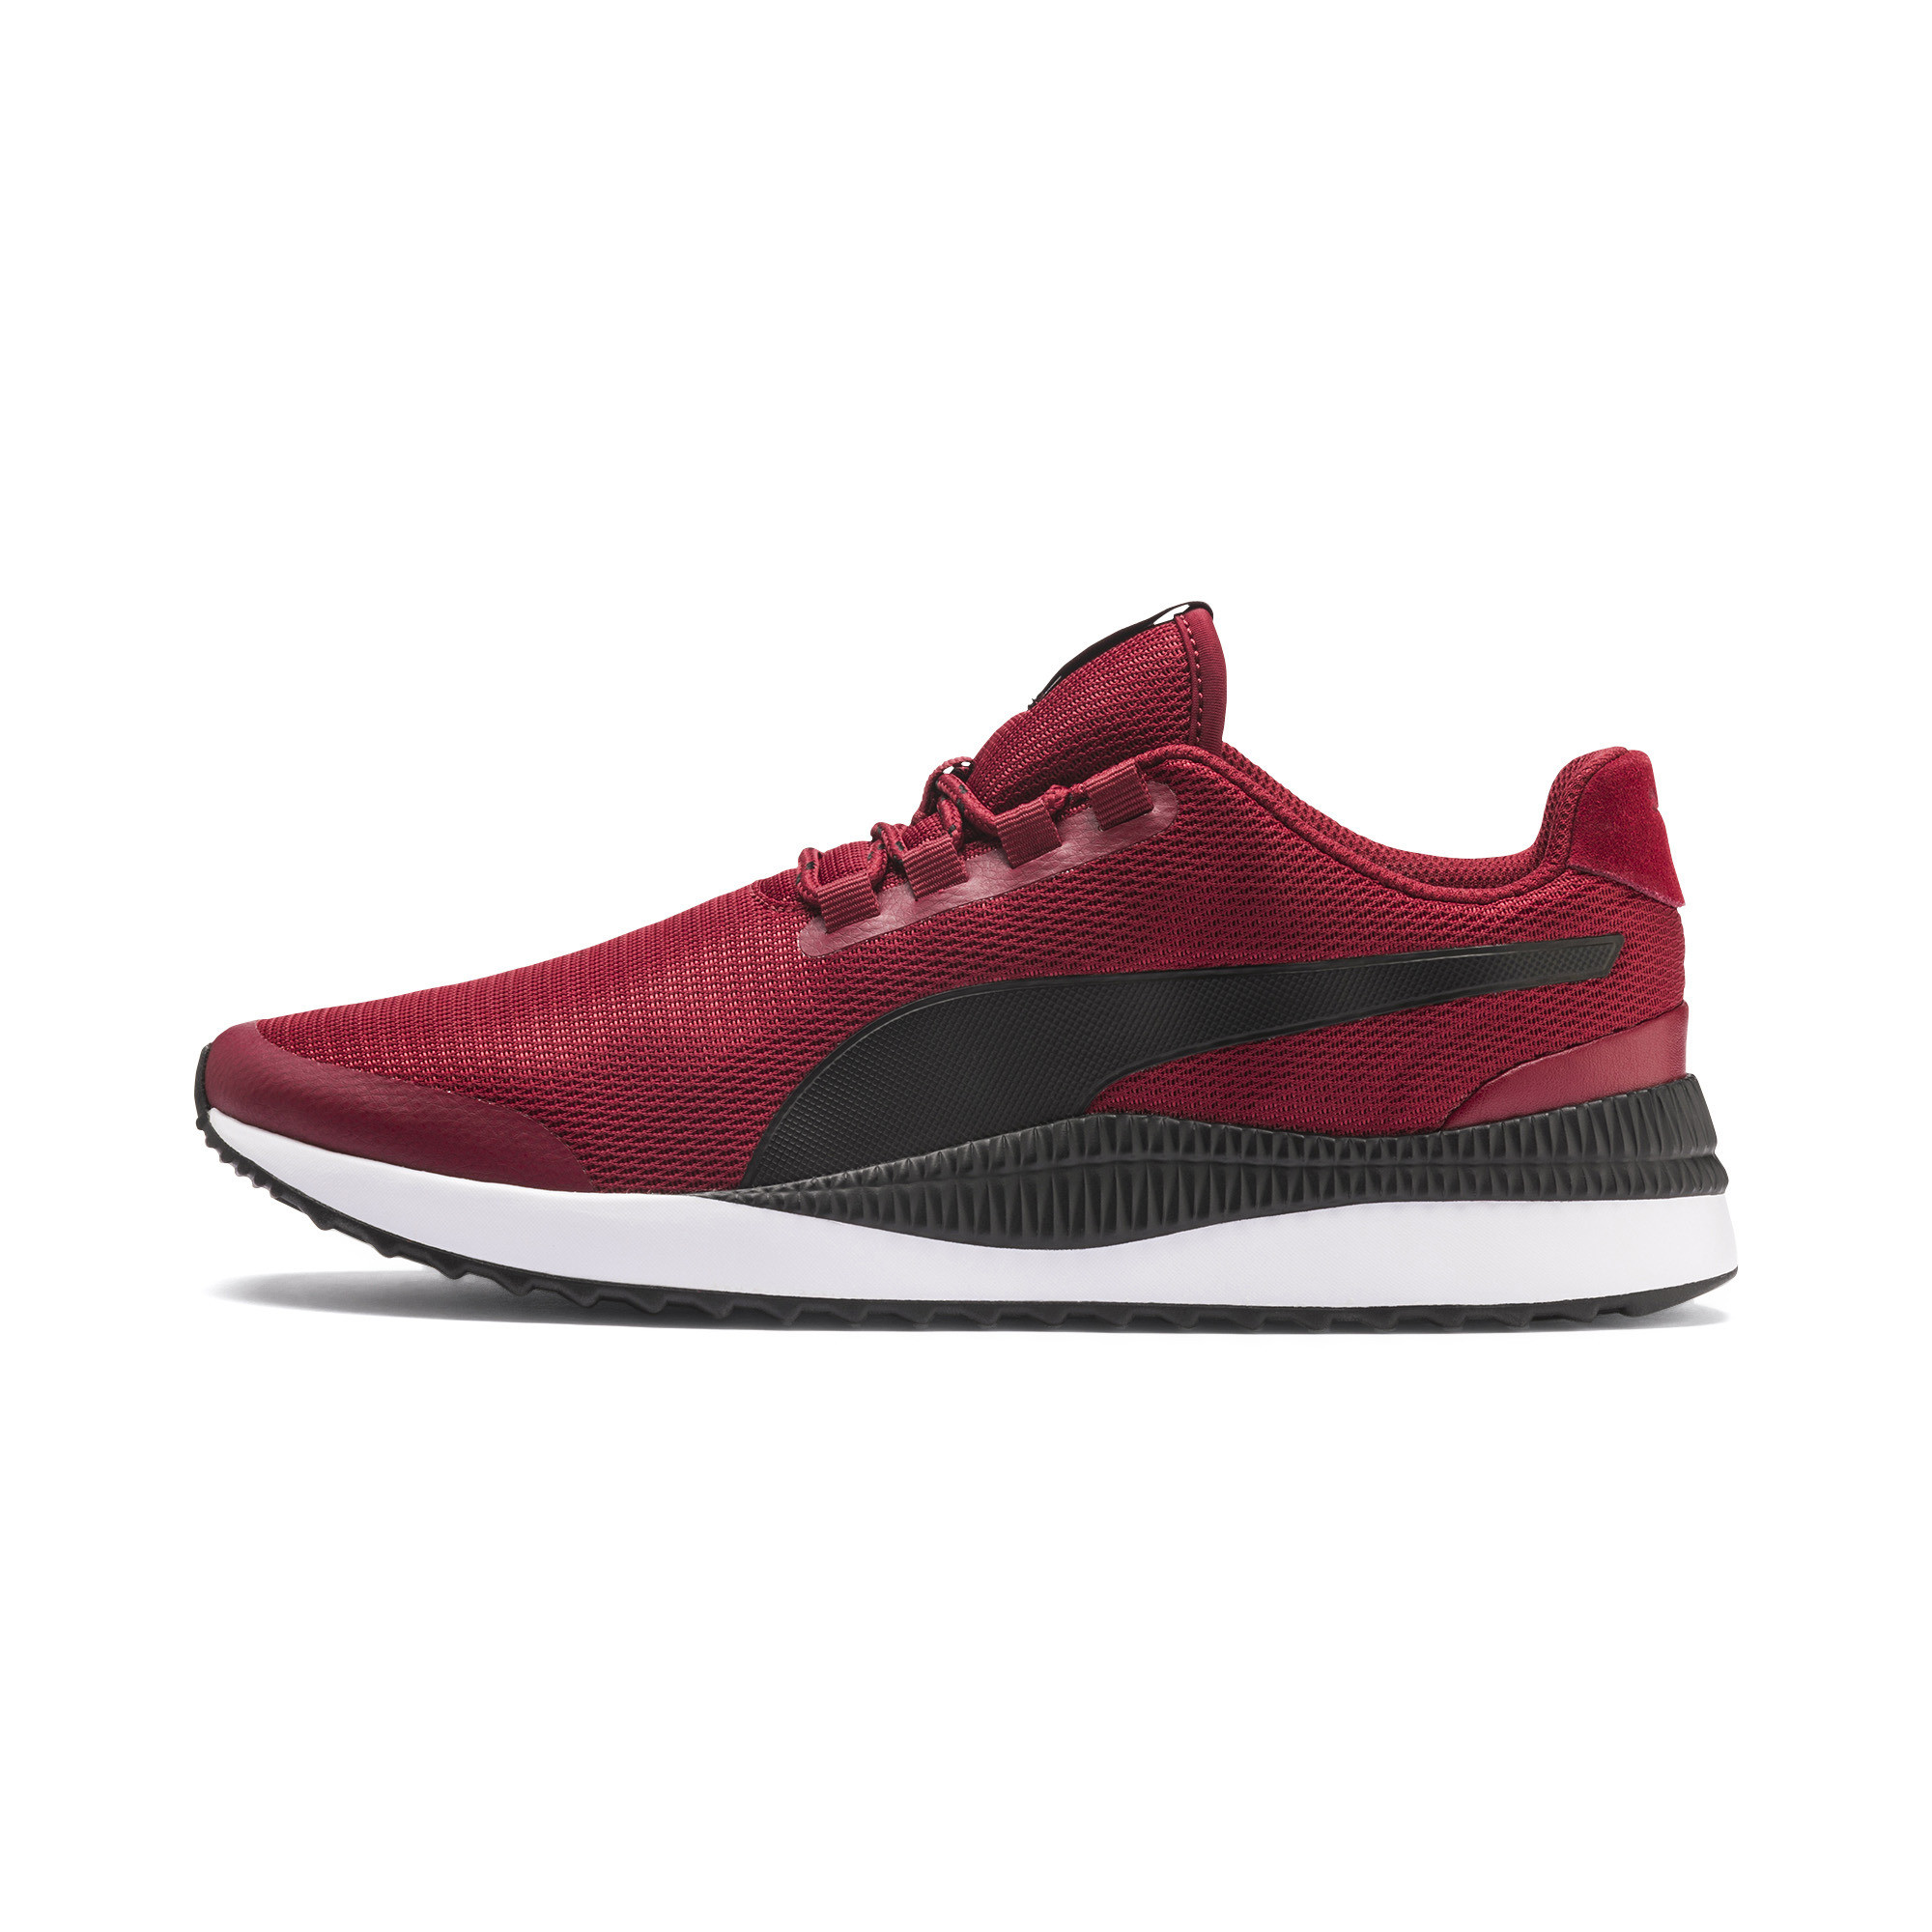 PUMA-Pacer-Next-FS-Men-039-s-Sneakers-Unisex-Shoe-Basics thumbnail 10